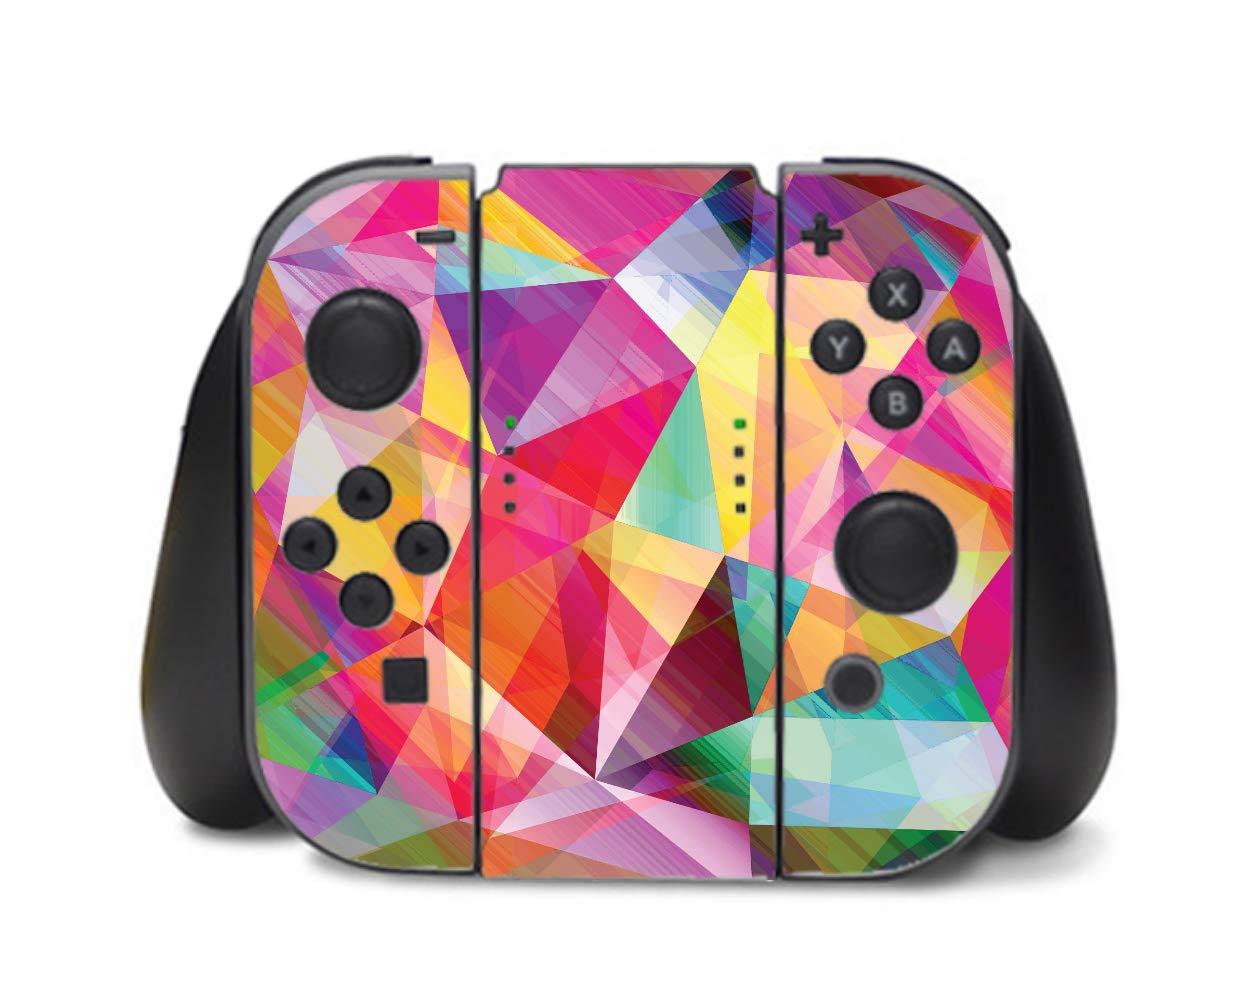 Bright Rainbow Polygon Design Vinyl Decal Sticker Skin by egeek amz for Nintendo Switch Controller